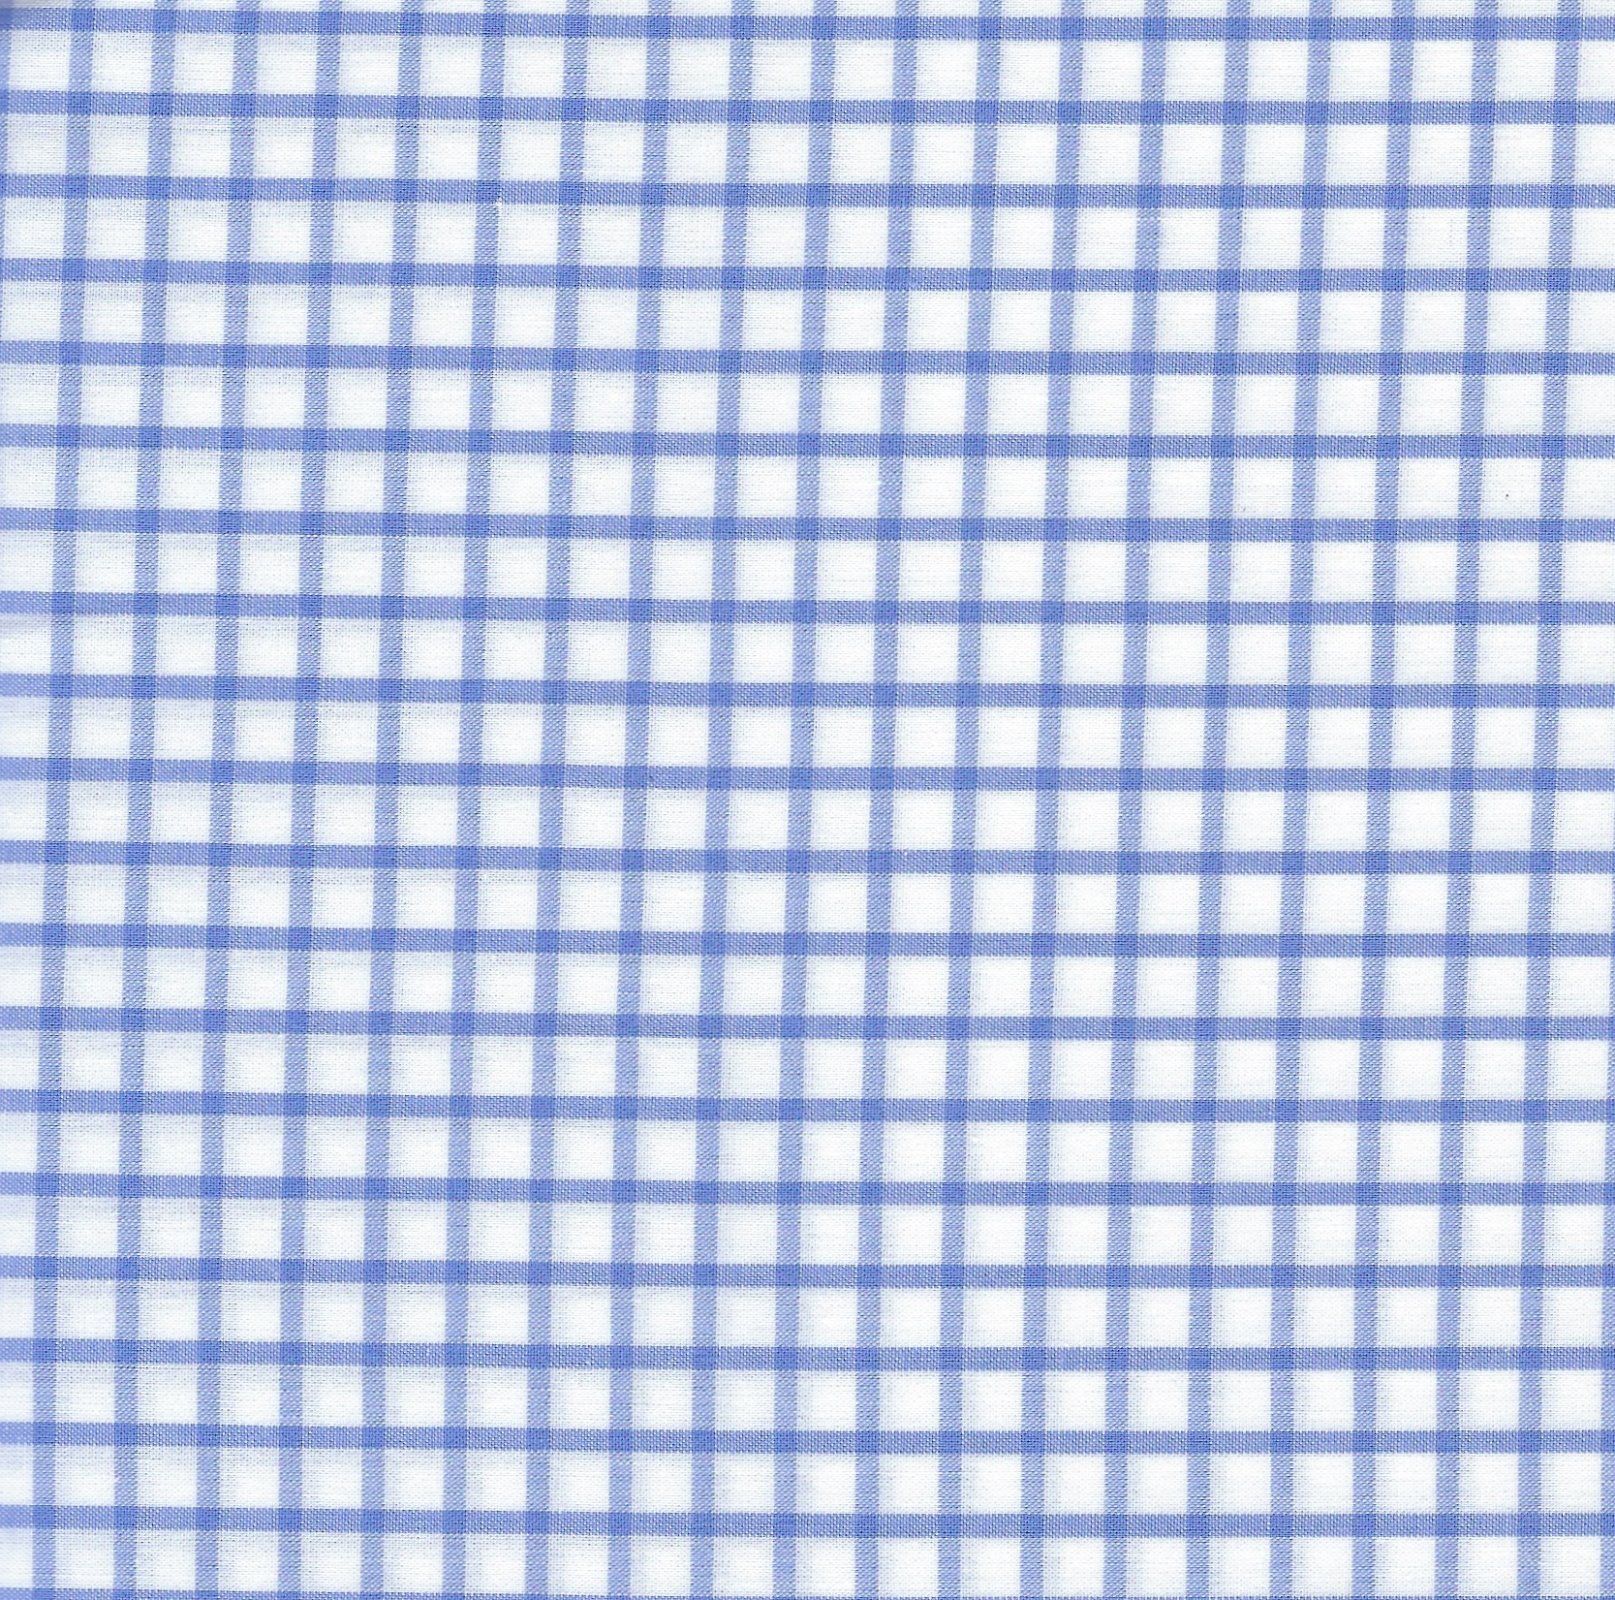 Spechler Vogel - Pastel Classics Windowpane Blue